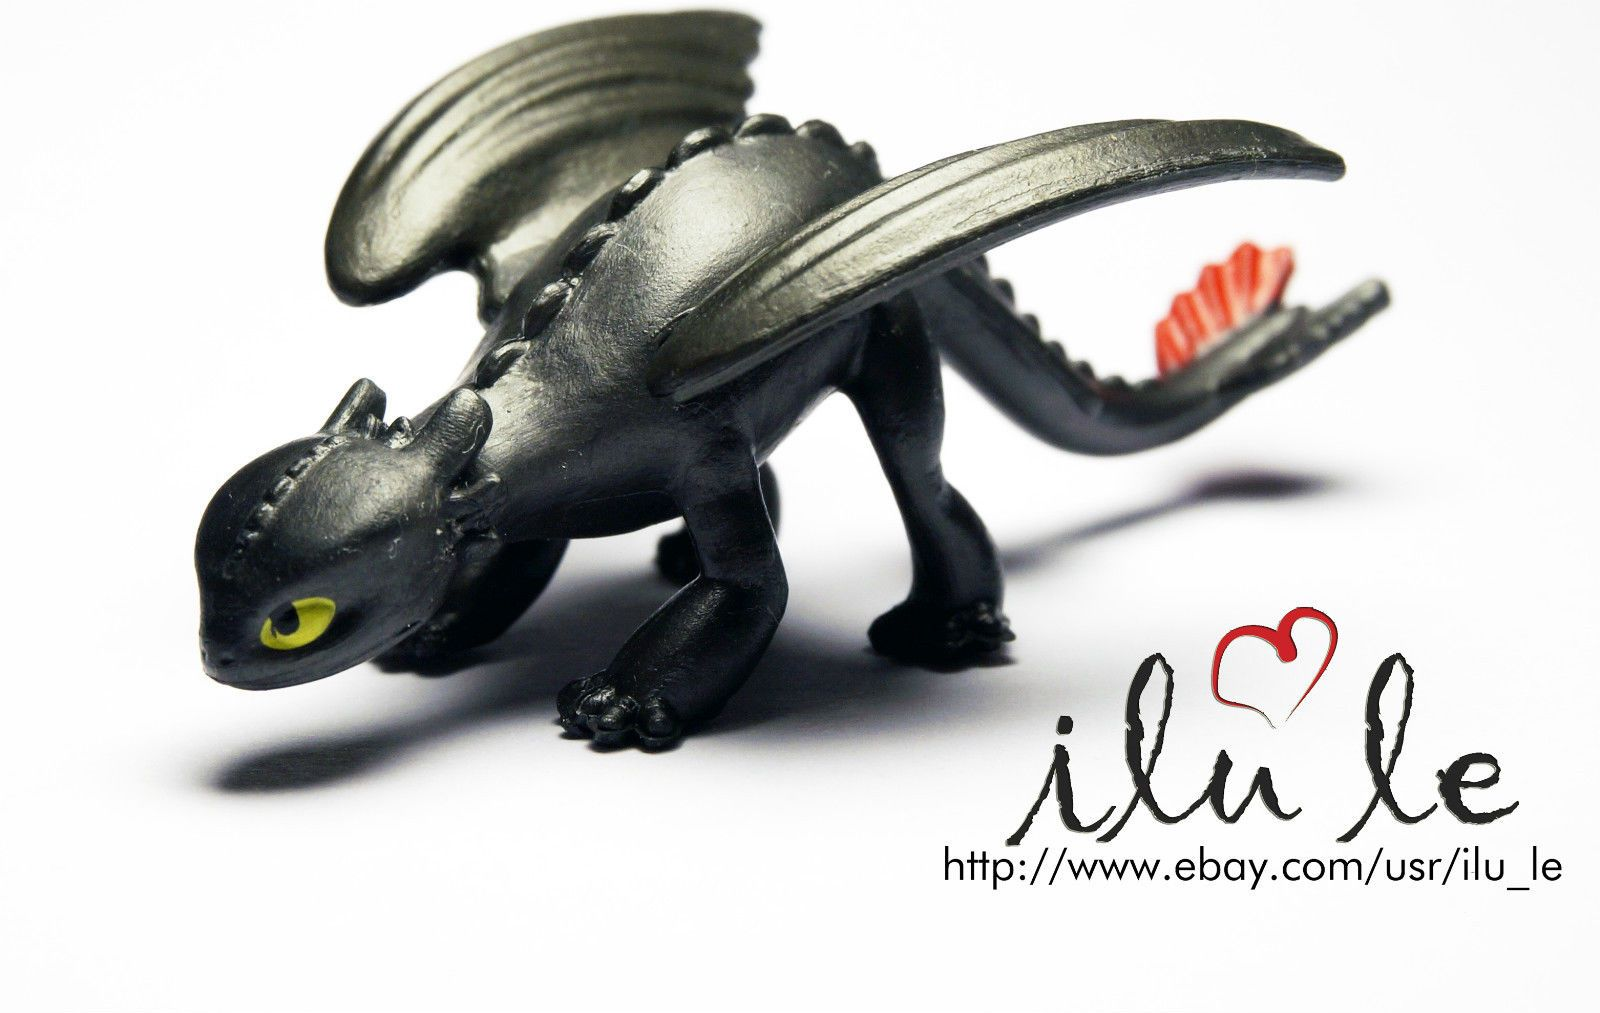 toothless night fury how to train your dragon Black Fury mini ...